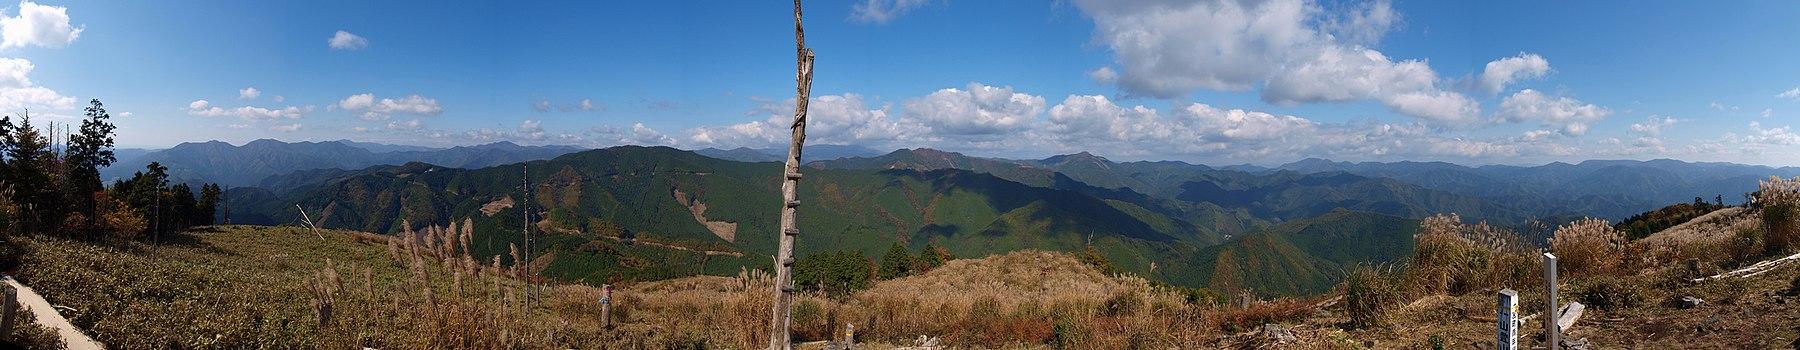 一山 - panoramio.jpg